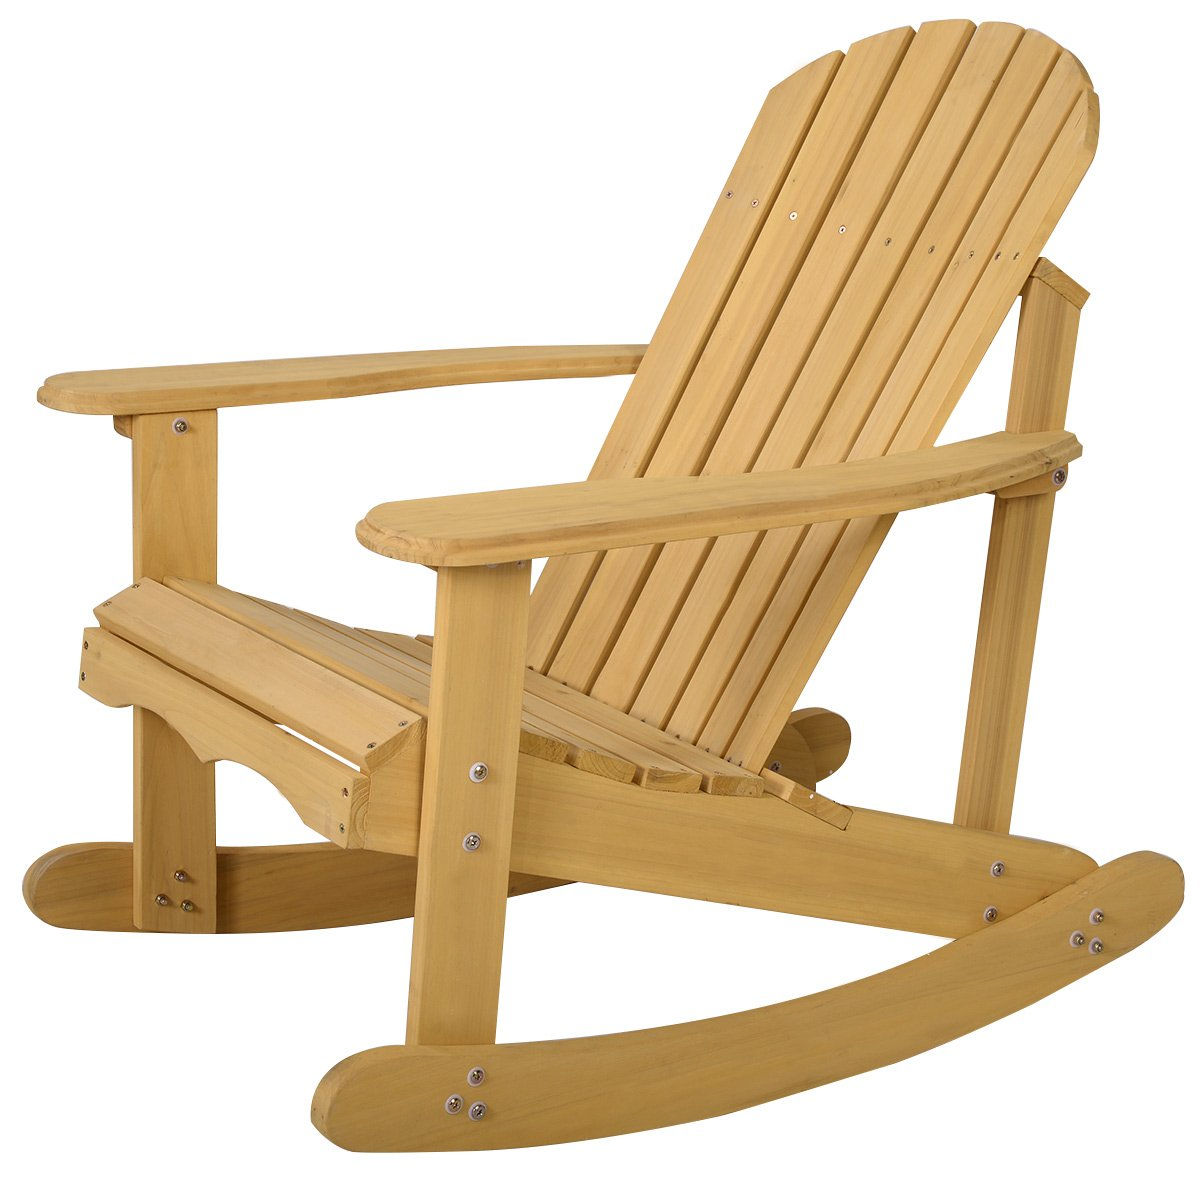 Wood Adirondack Rocking Chair - Amazon com giantex outdoor natural fir wood adirondack rocking chair patio deck garden furniture patio lawn garden